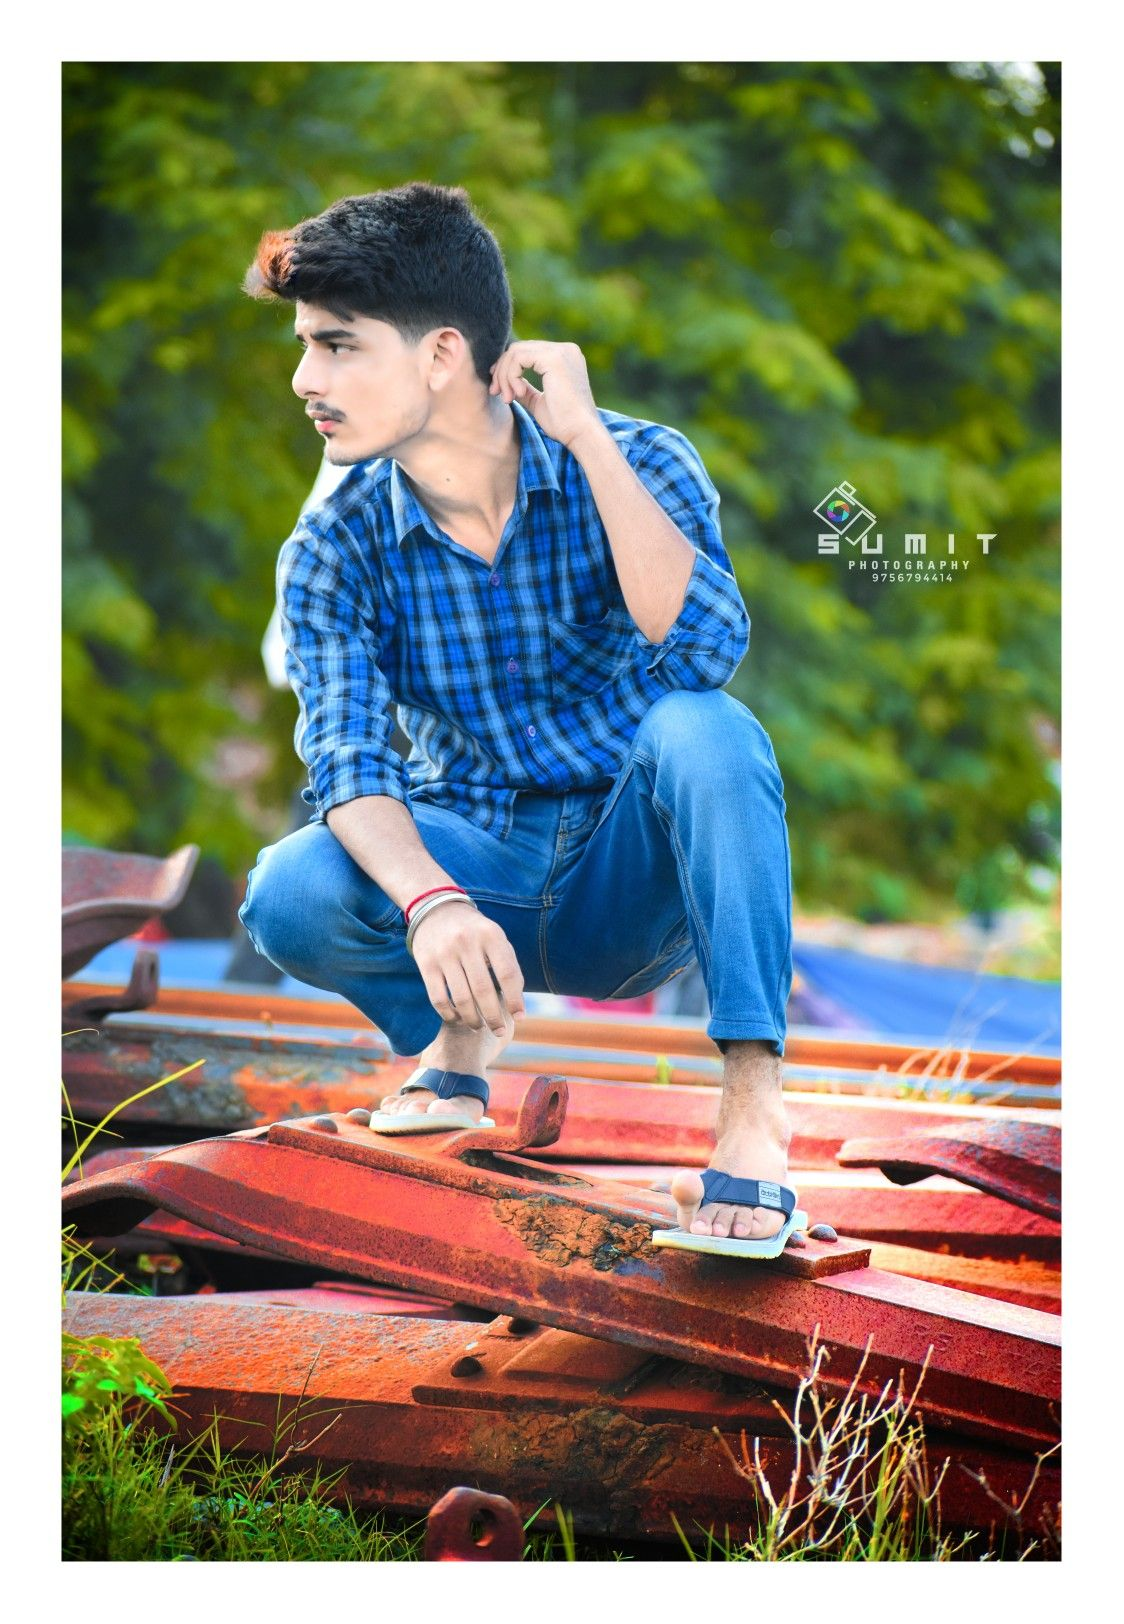 Sumit Chahar Jaat Attitude Pose Boy Poses Photography Poses For Men Boy Photography Poses